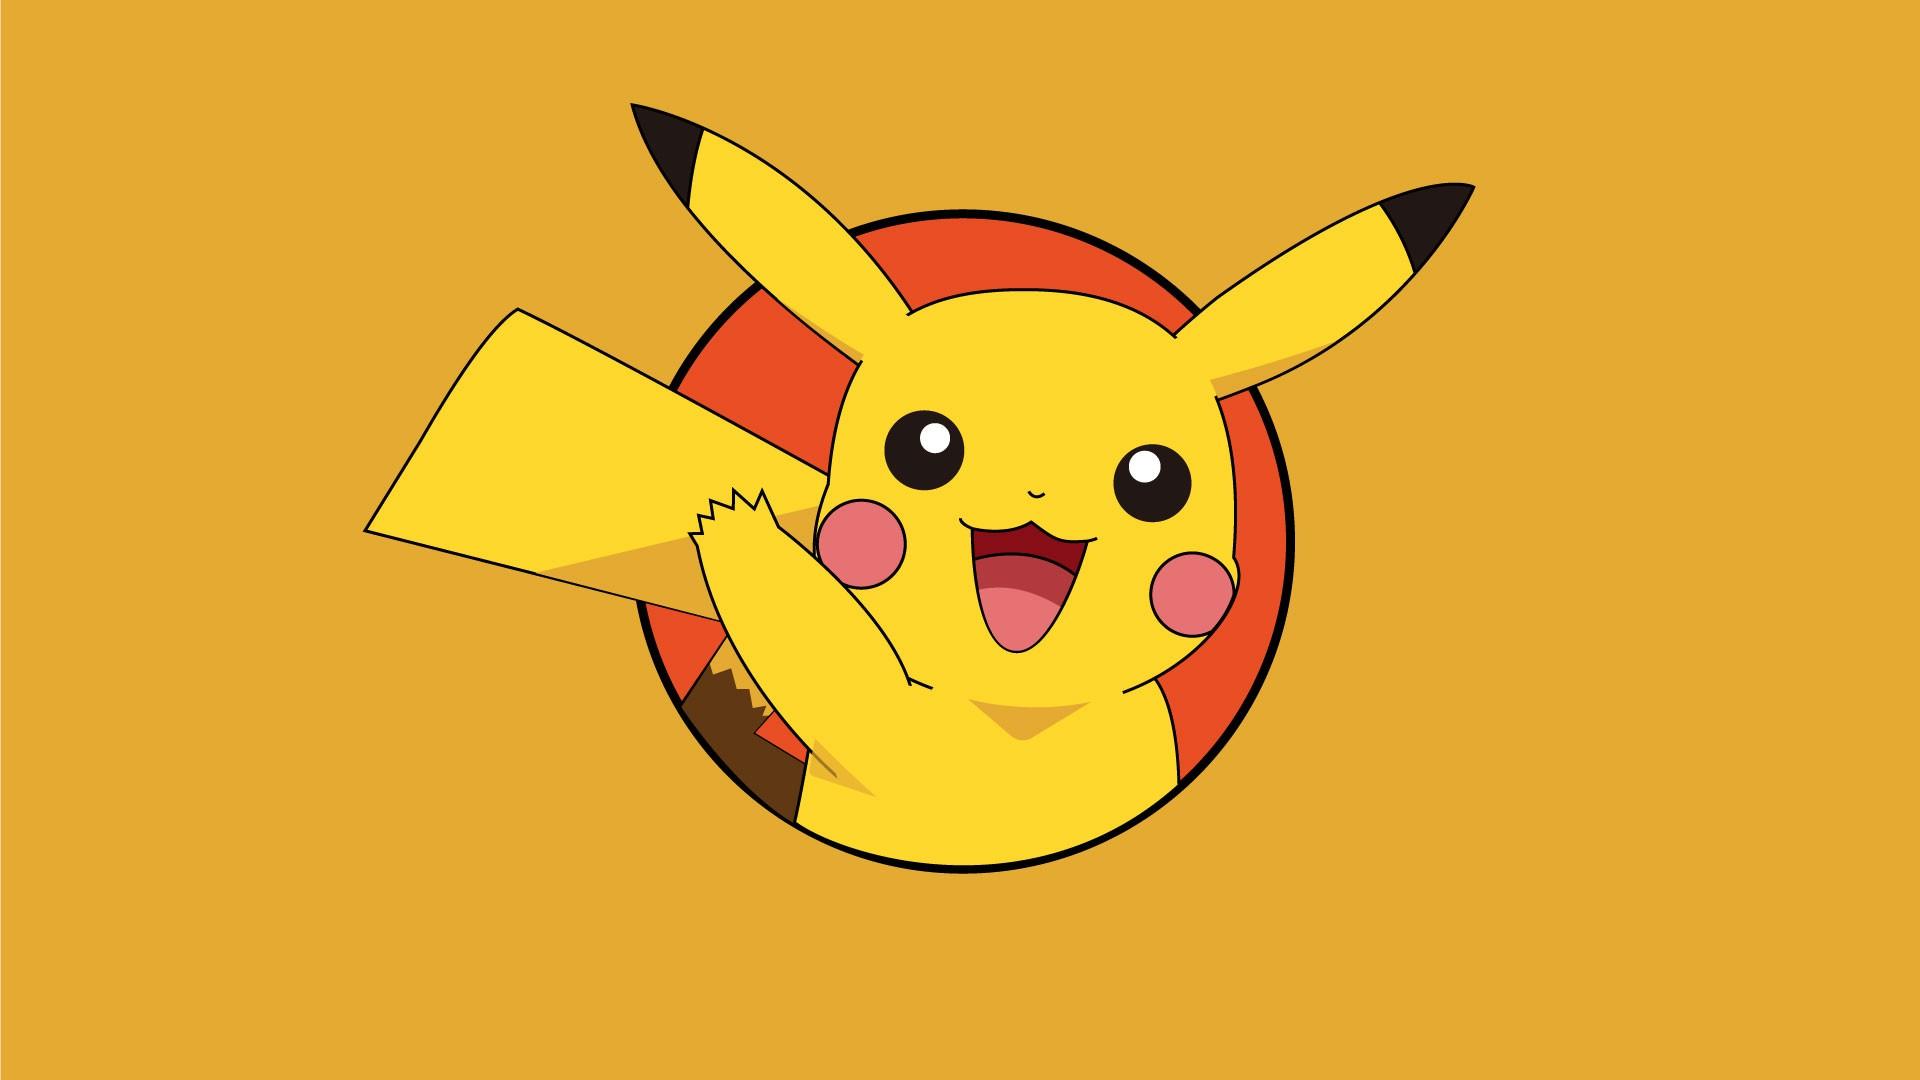 Hình nền Pikachu cute